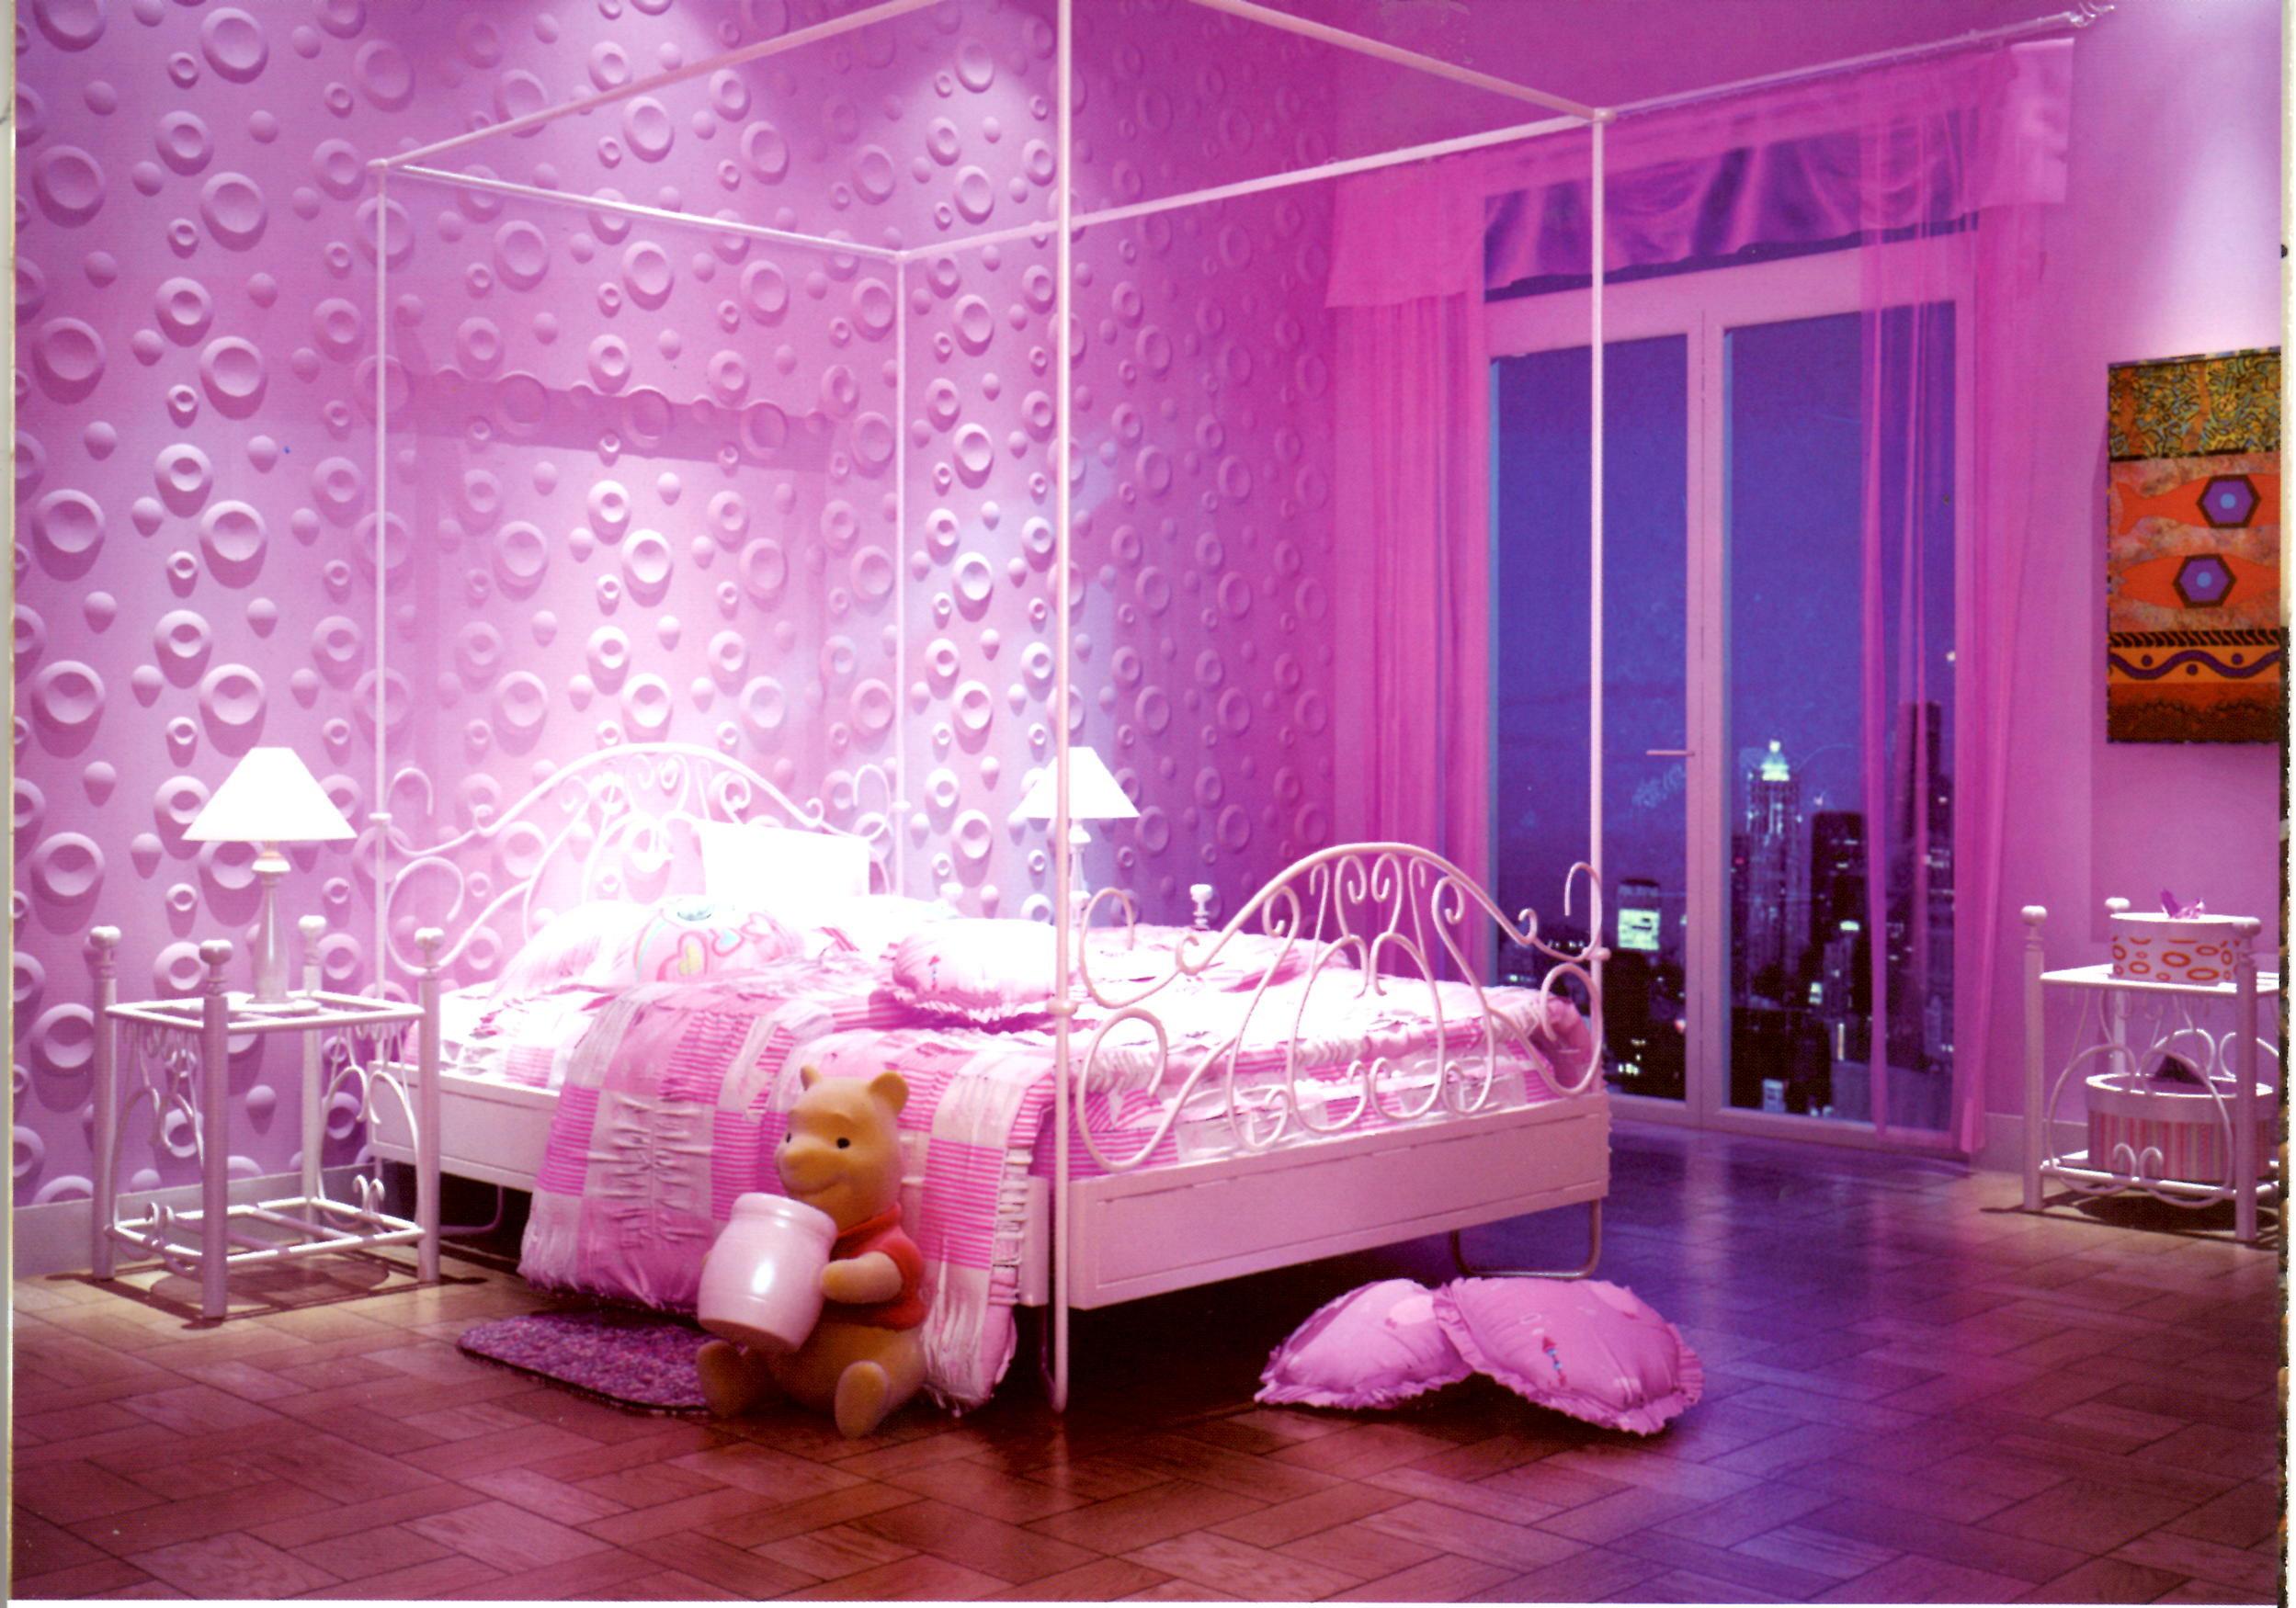 Pink Wallpaper for Bedrooms wallpaper Pink Wallpaper for Bedrooms hd 2498x1750